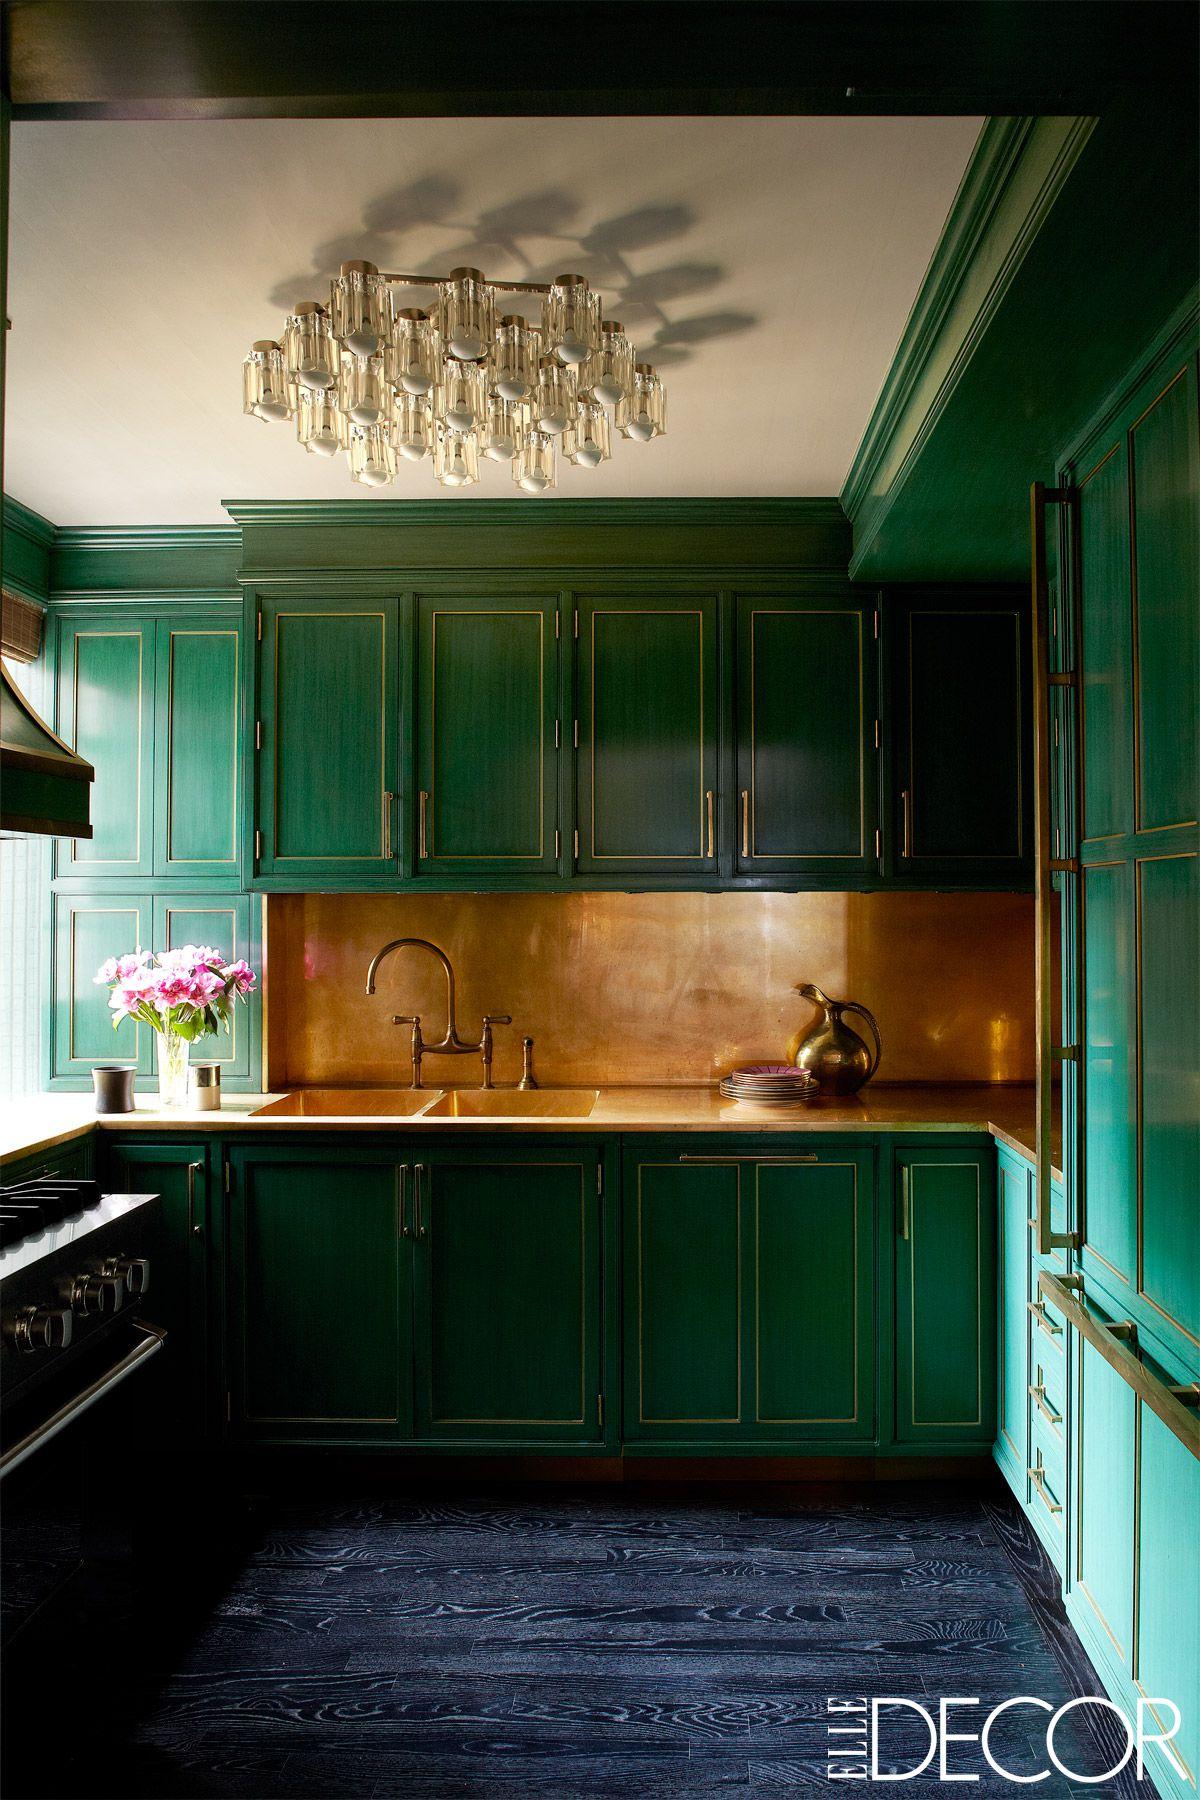 emerald green kitchen with cooper backsplash